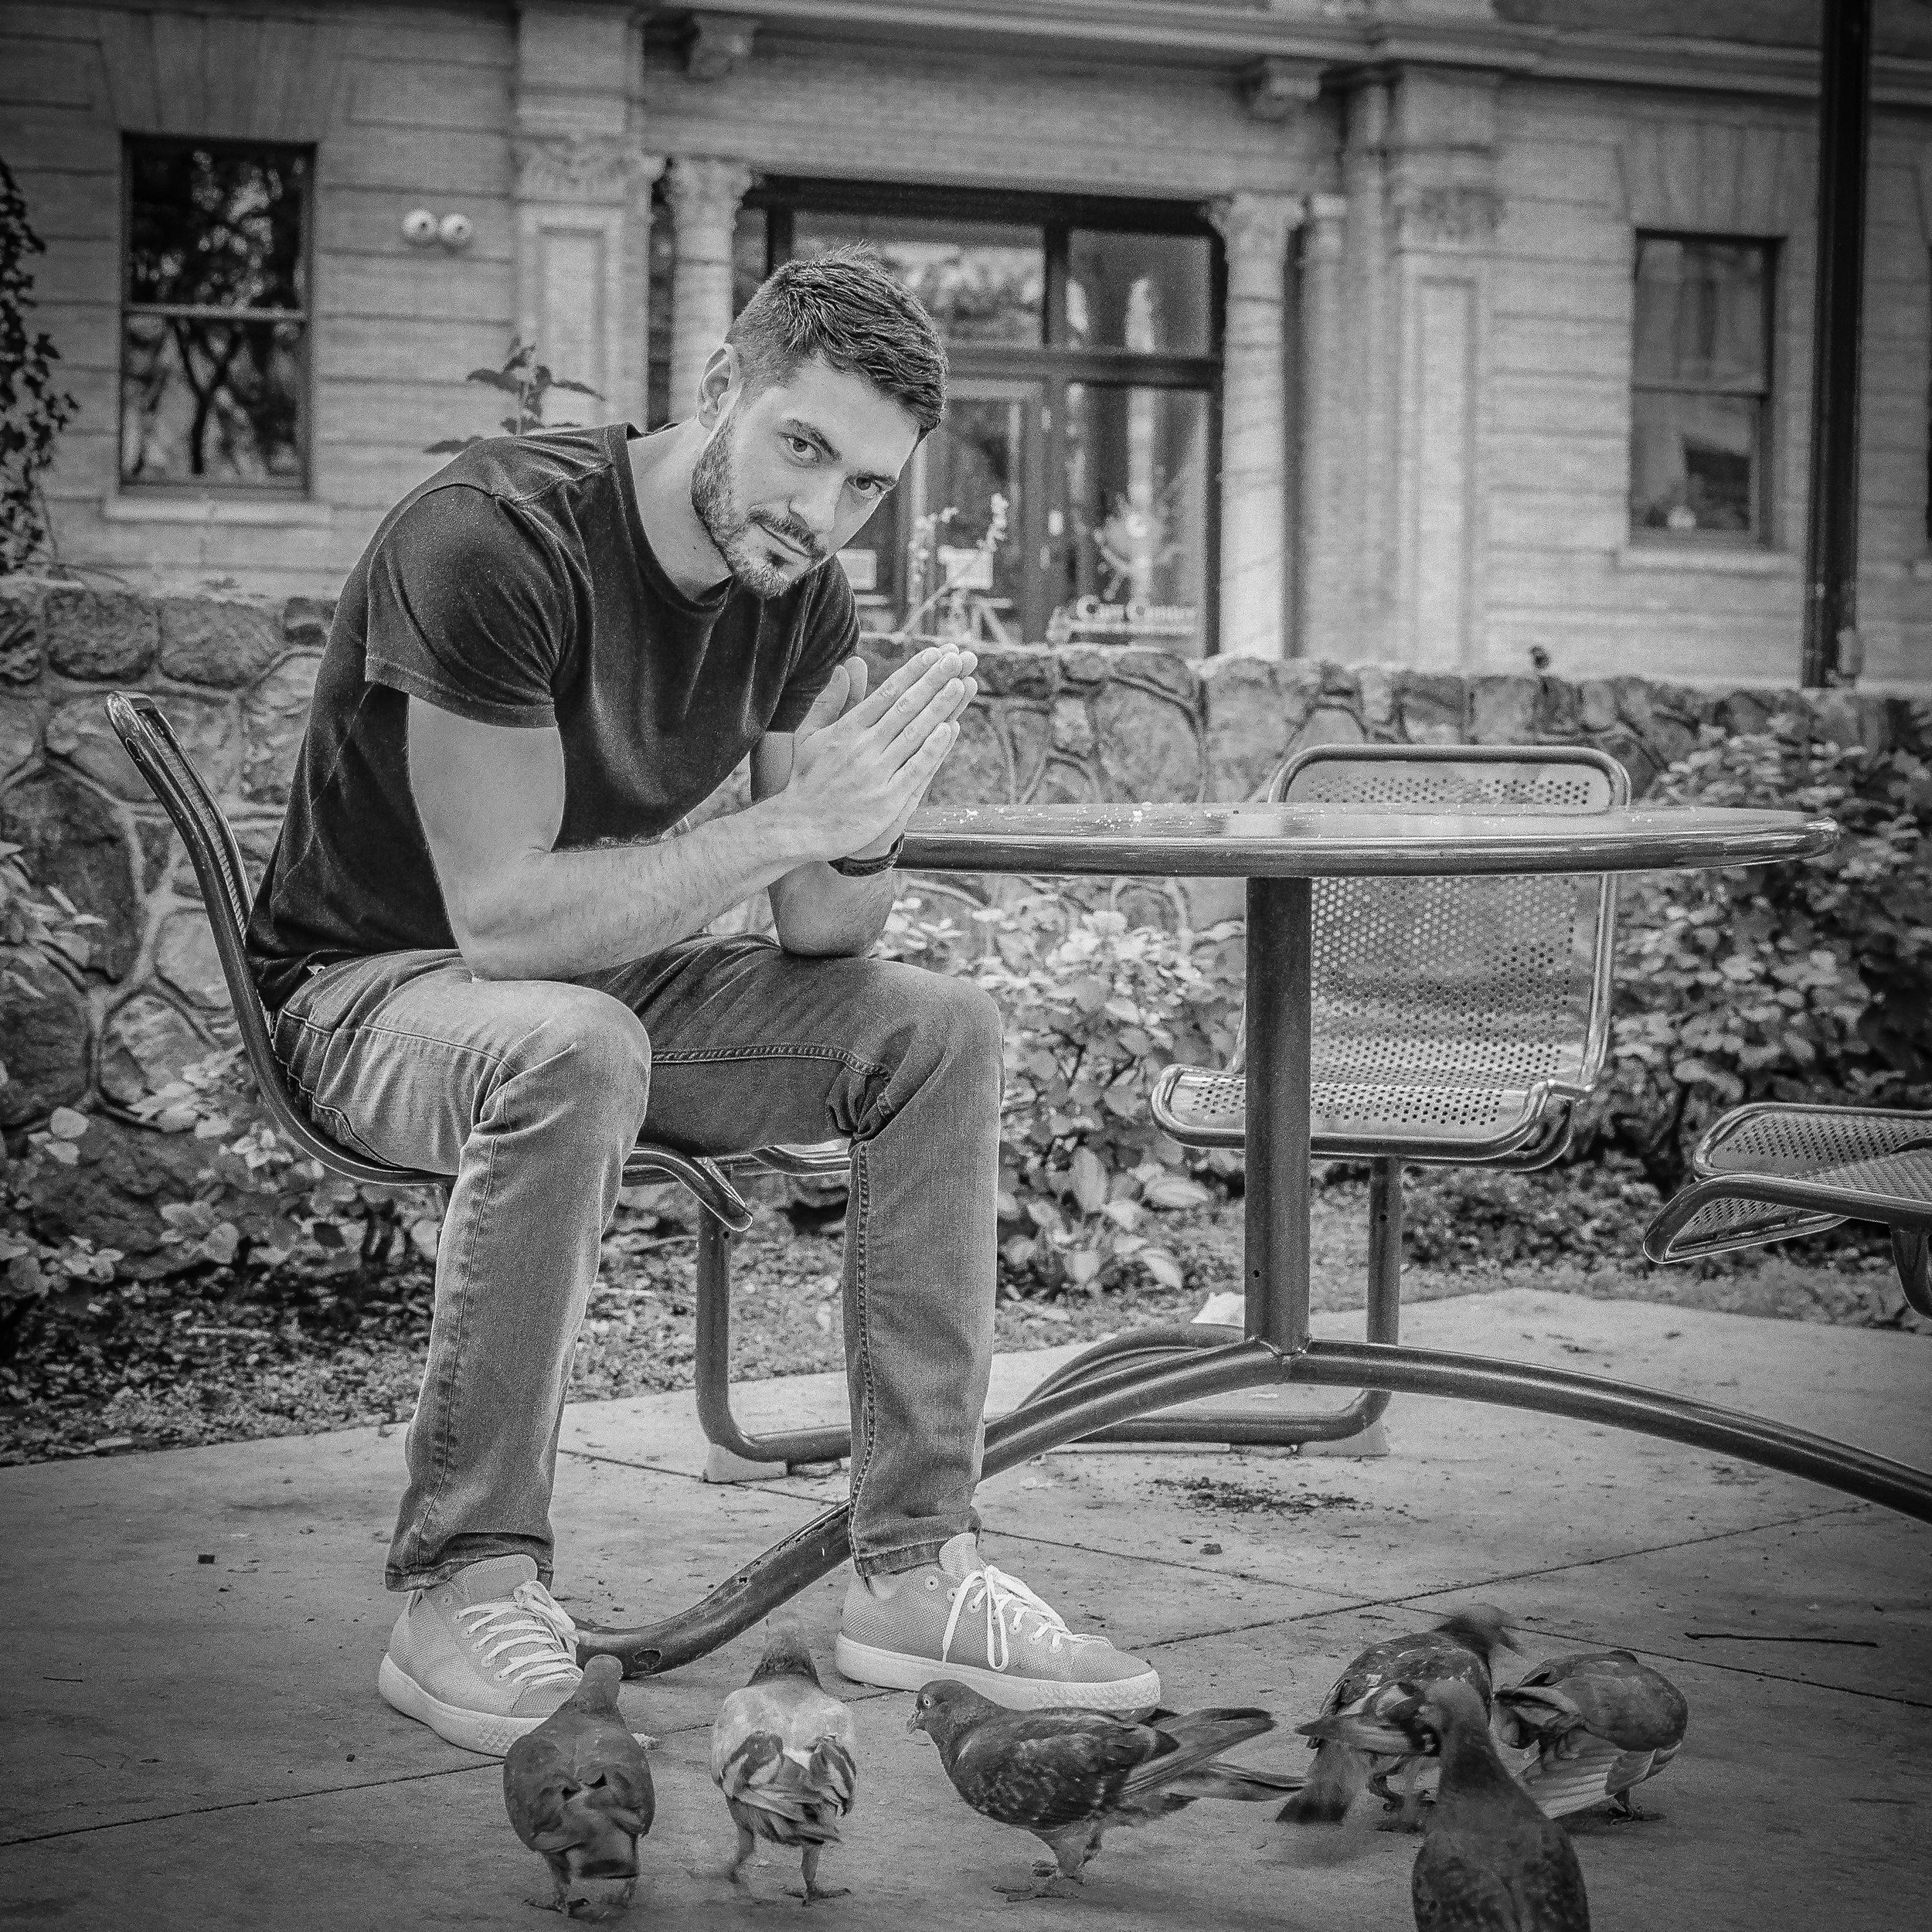 Patrick Sexton Portrait August 2017-39310007.jpg